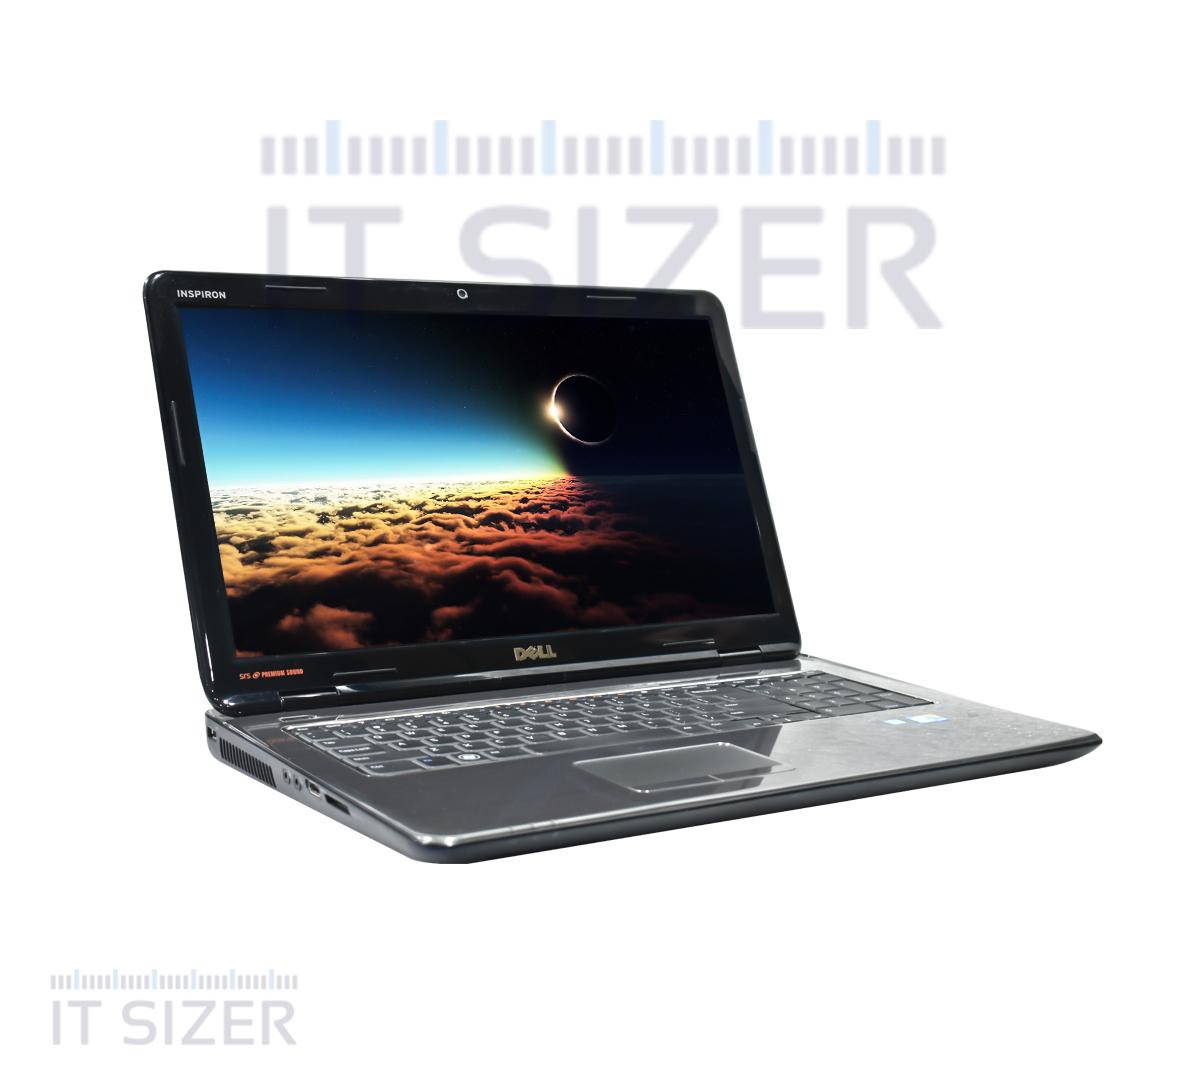 Dell Inspiron N7010 Business Laptop, INTEL CORE I5-M460 CPU @ 2.53GHZ CPU, 4GB DDR3 SODIMM, 750GB SATA 2.5 , 17 inch Display (Renewed)